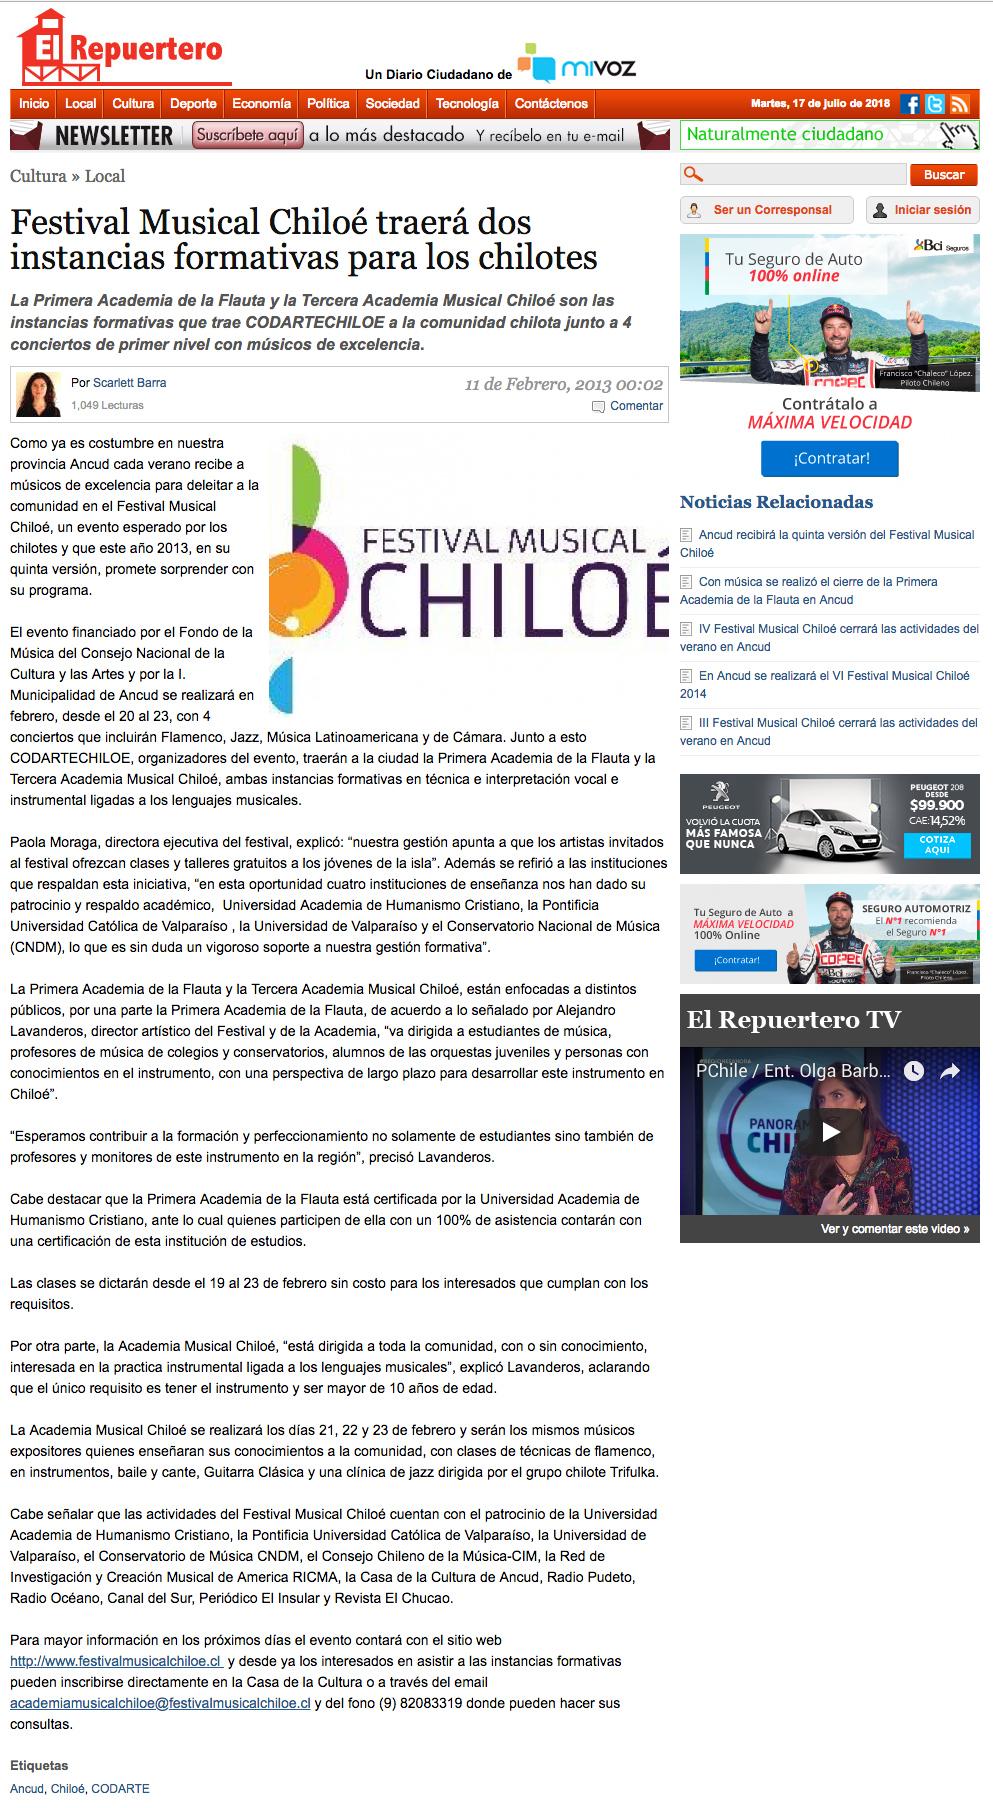 V-2013-11-02-el-repuertero